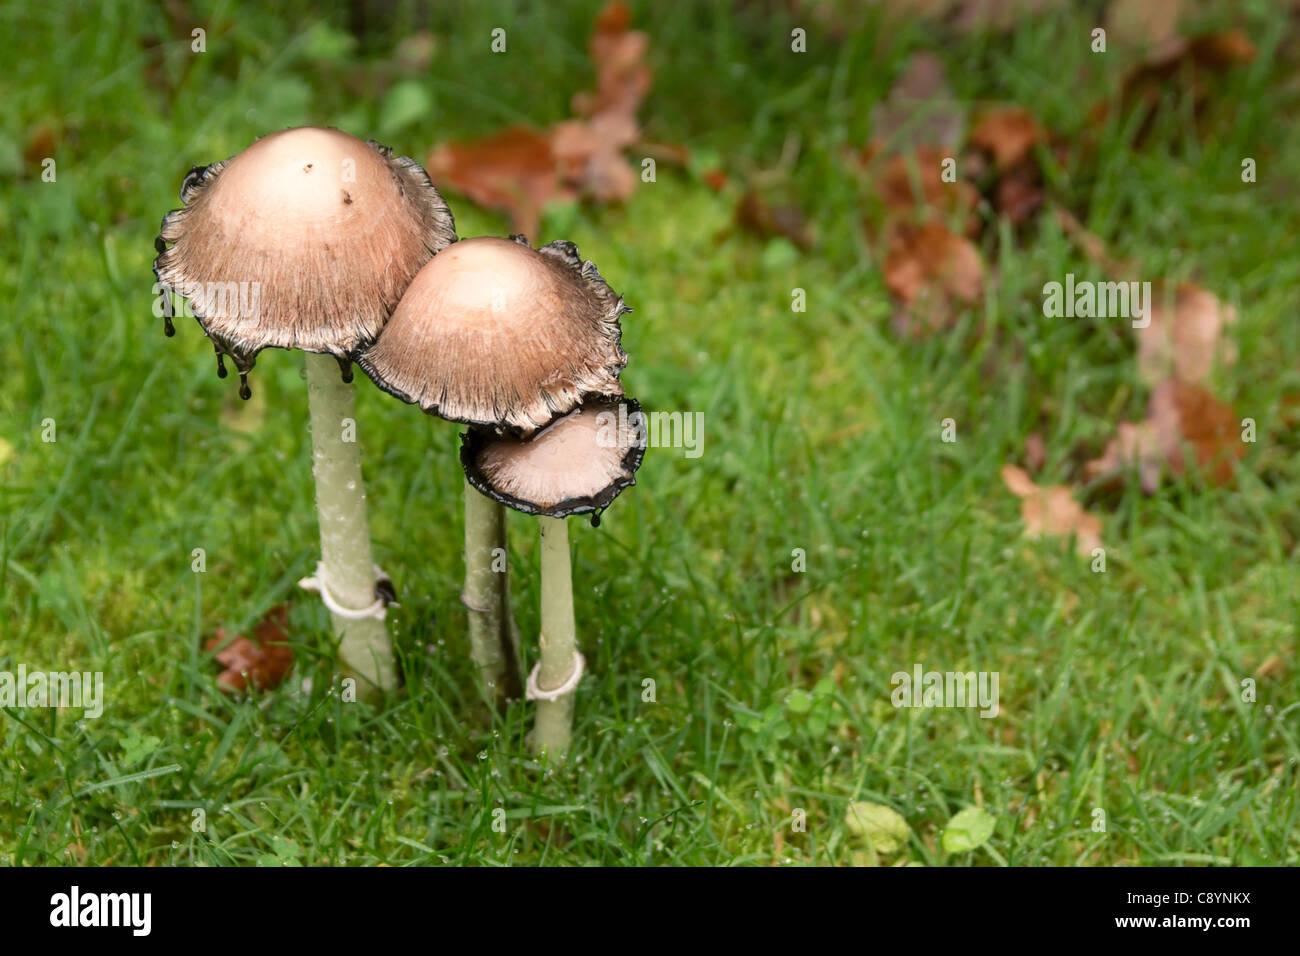 Geliebte Drei Garten Pilze im Rasen Stockfoto, Bild: 39947710 - Alamy &XN_49